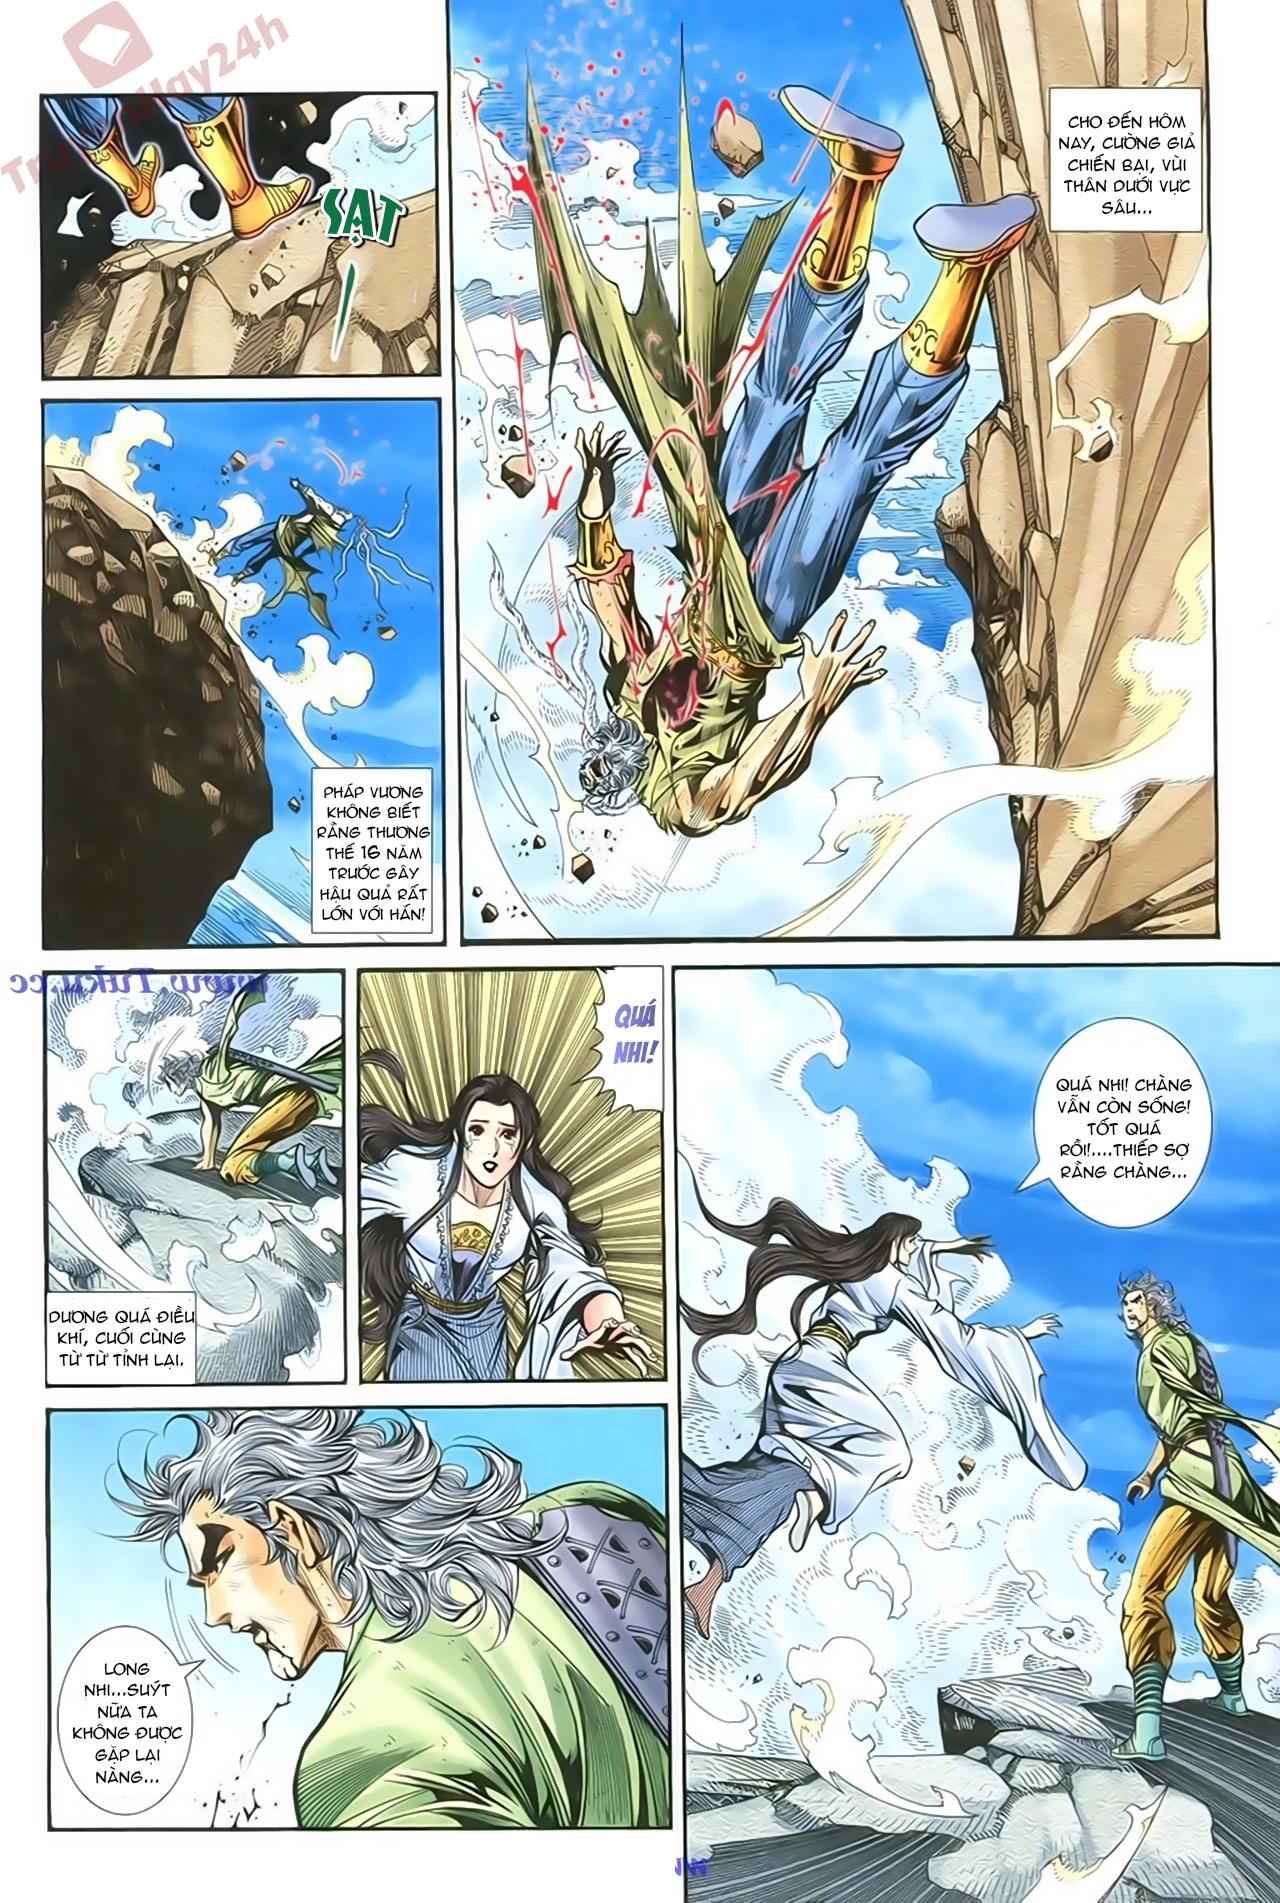 Thần Điêu Hiệp Lữ chap 86 – End Trang 32 - Mangak.info